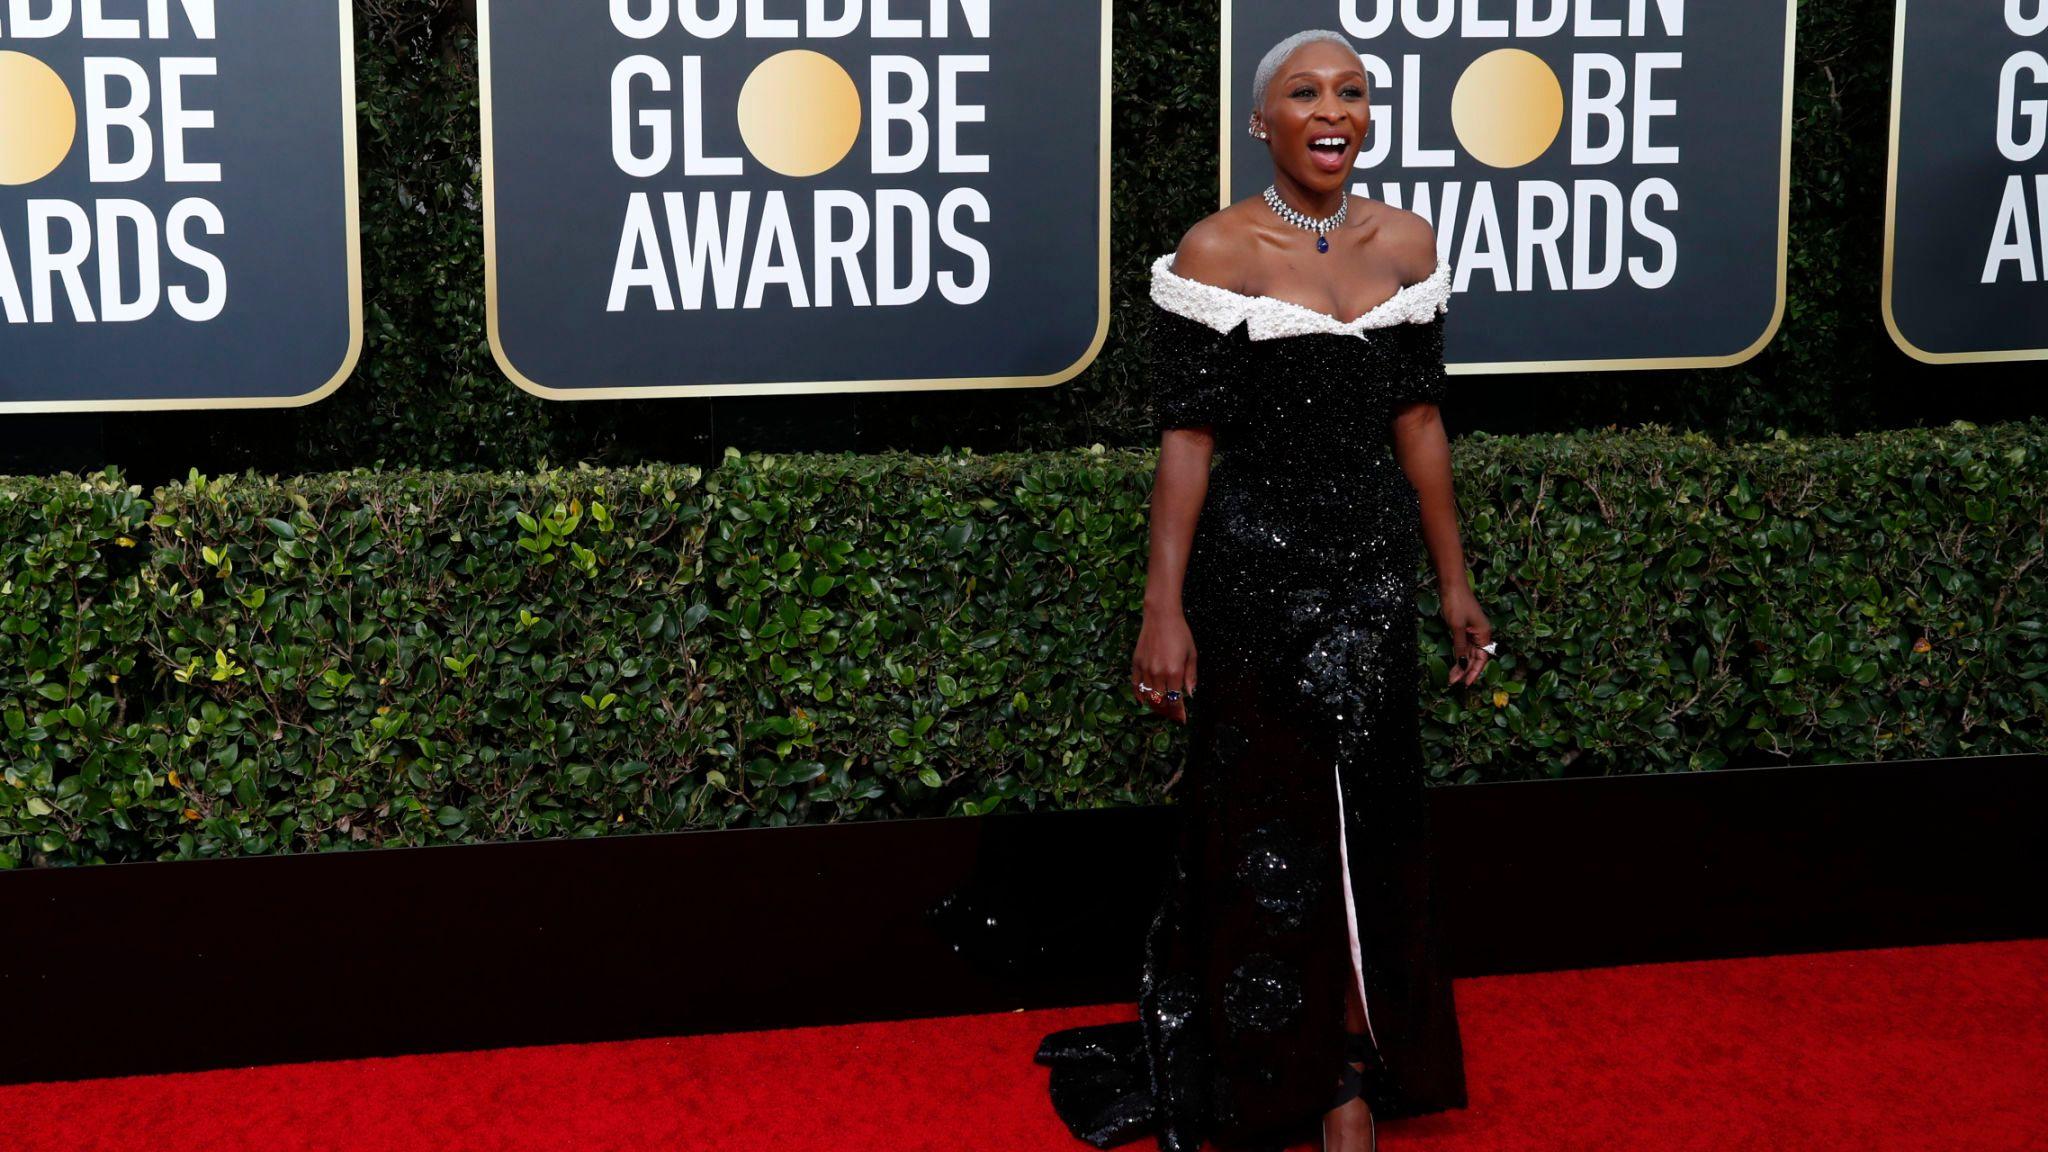 Cynthia Erivo at the Golden Globes